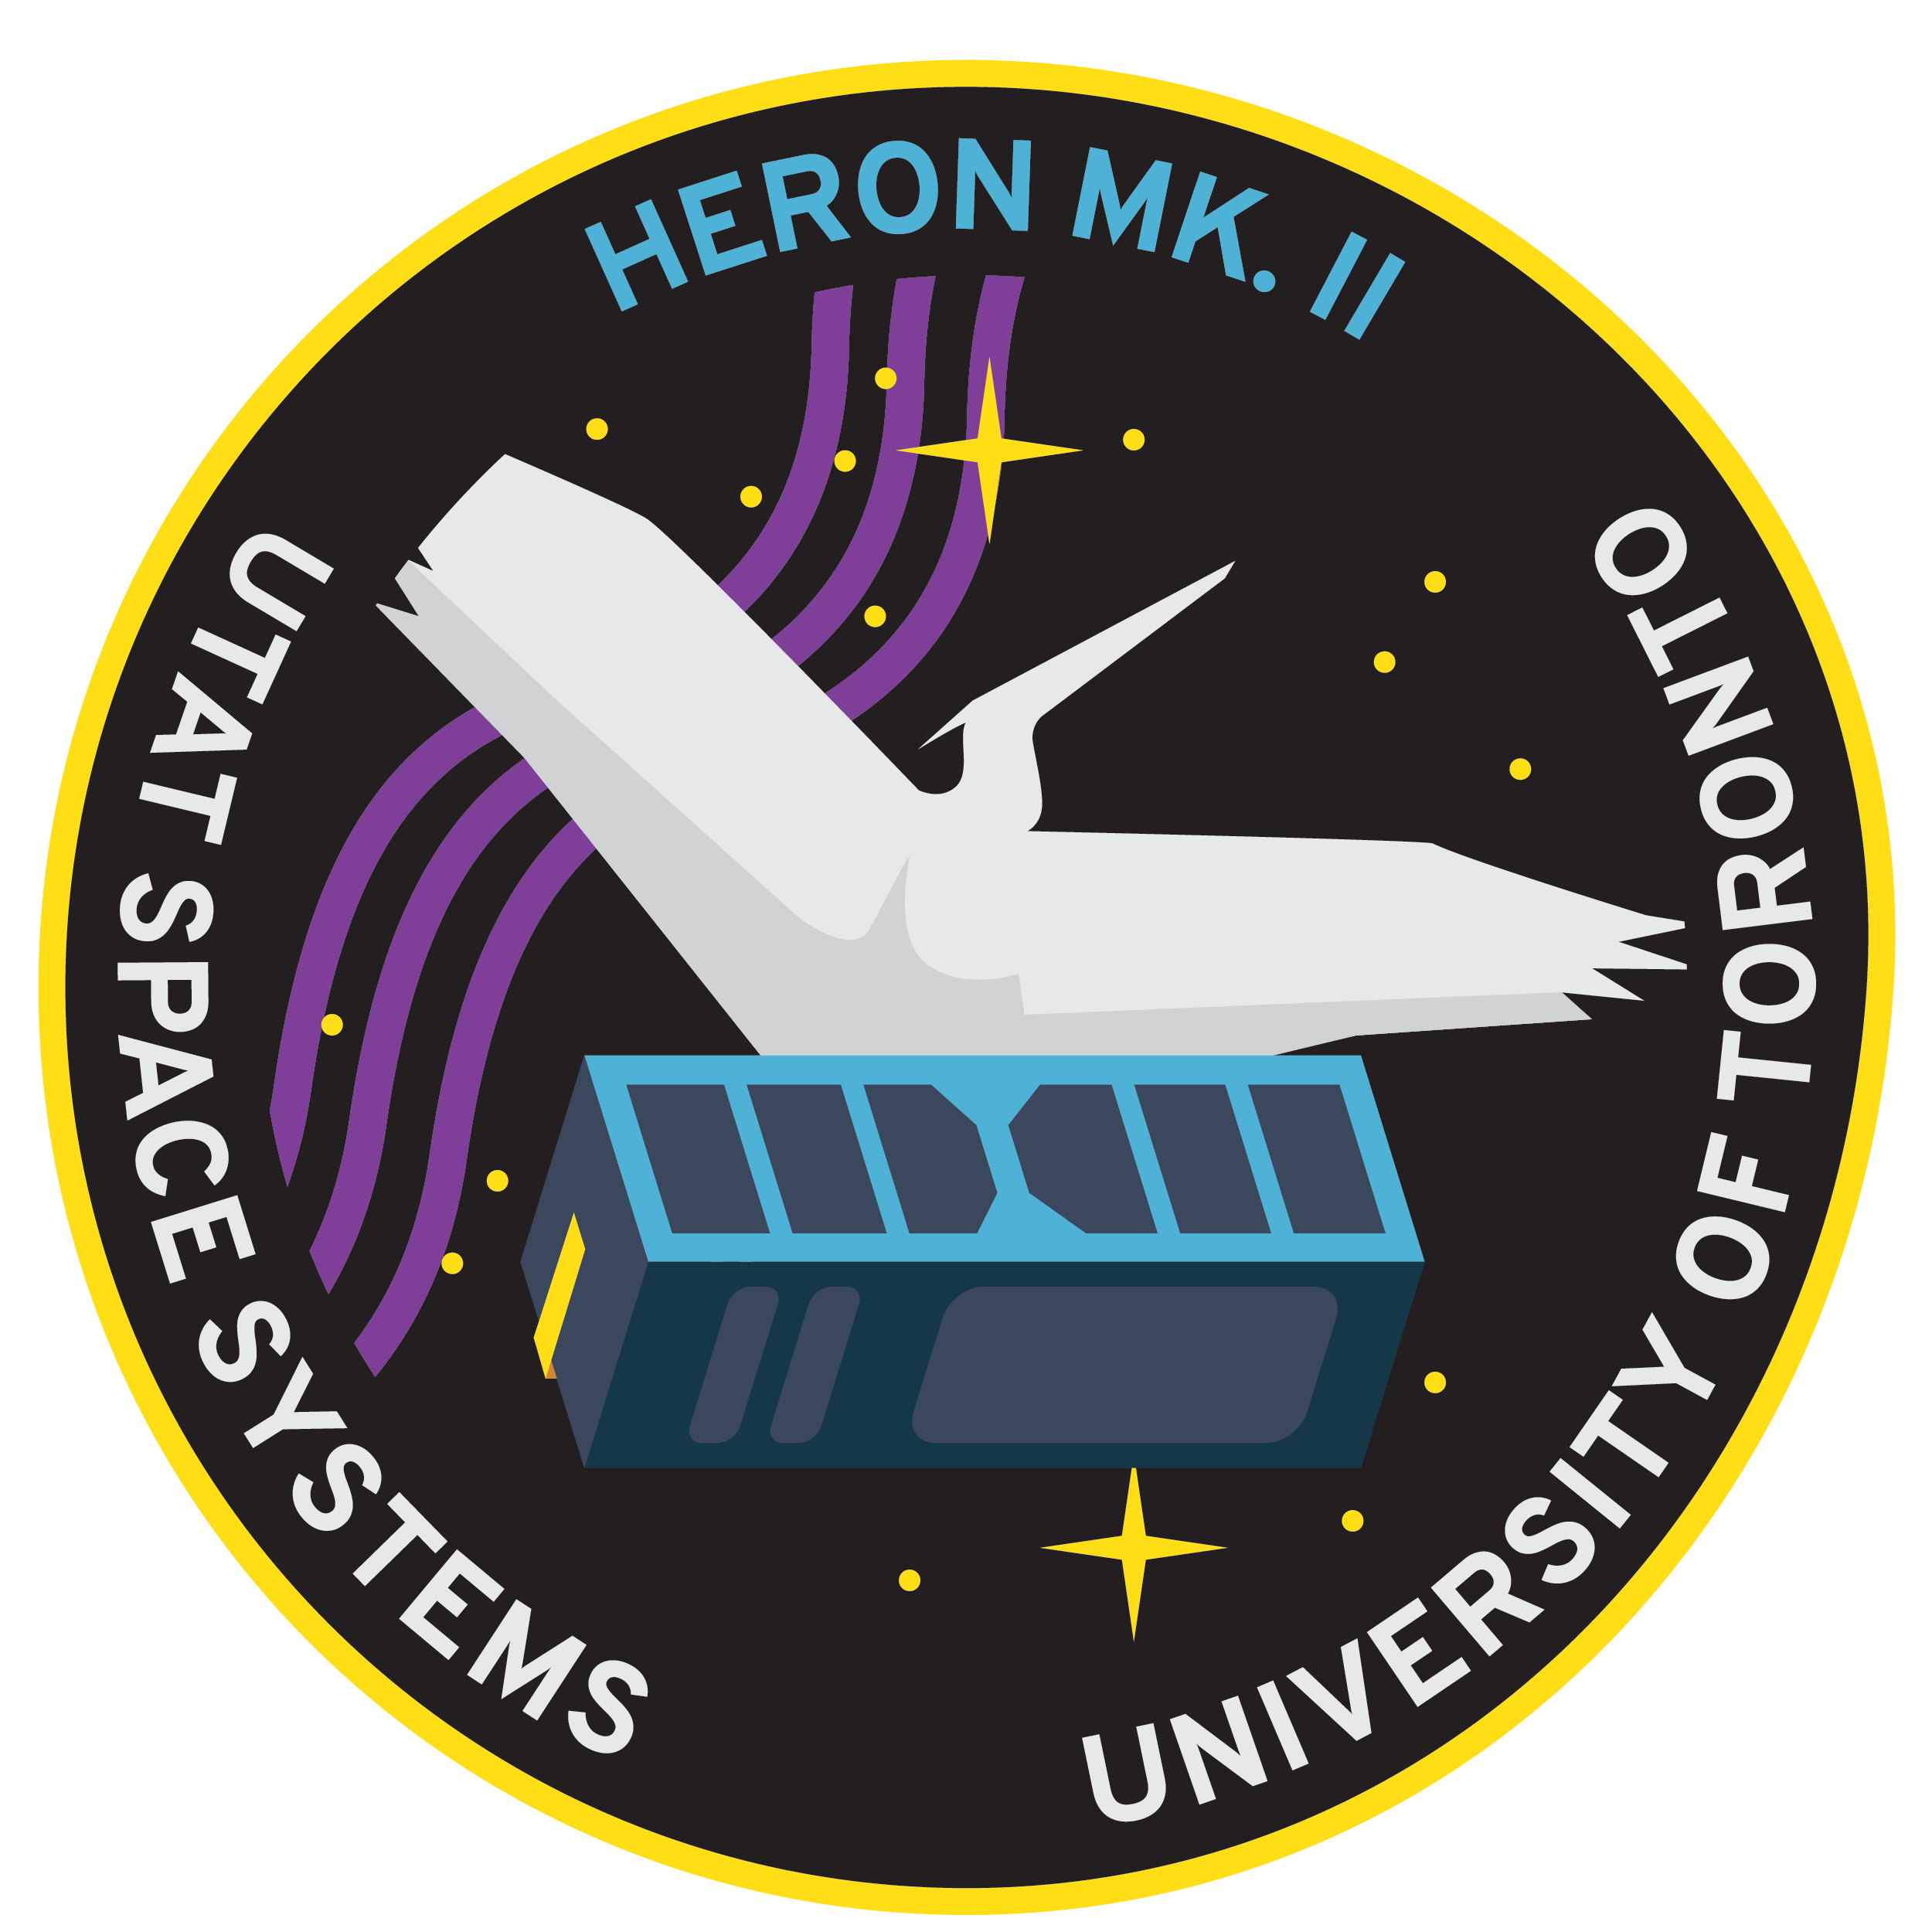 UTAT_SS_HERON2_v4-01.png